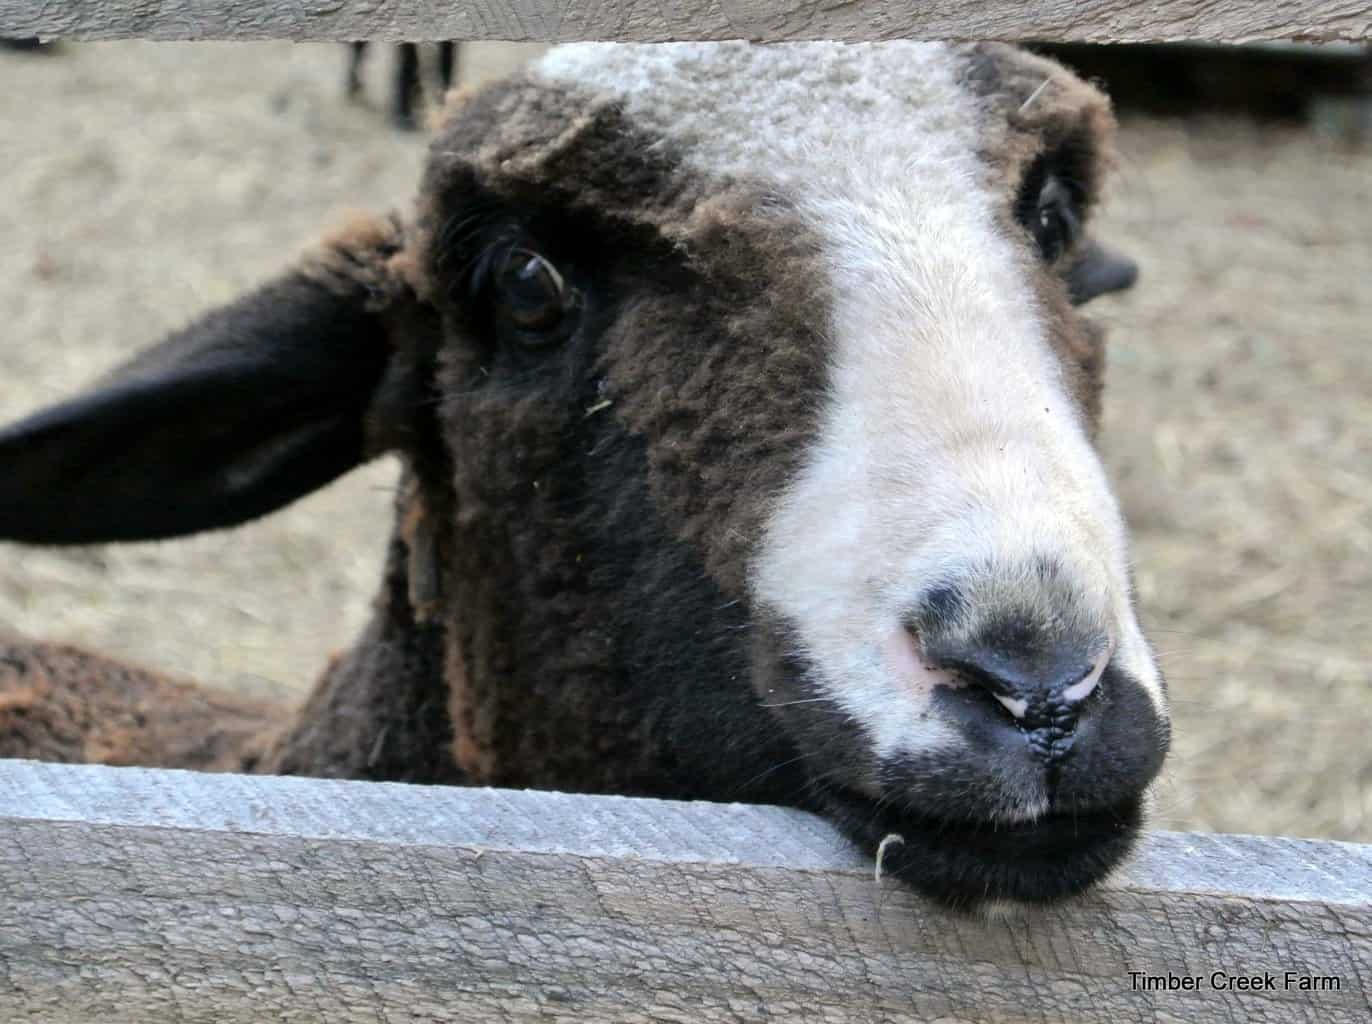 Raising Sheep Without Grazing Pastures Timber Creek Farm